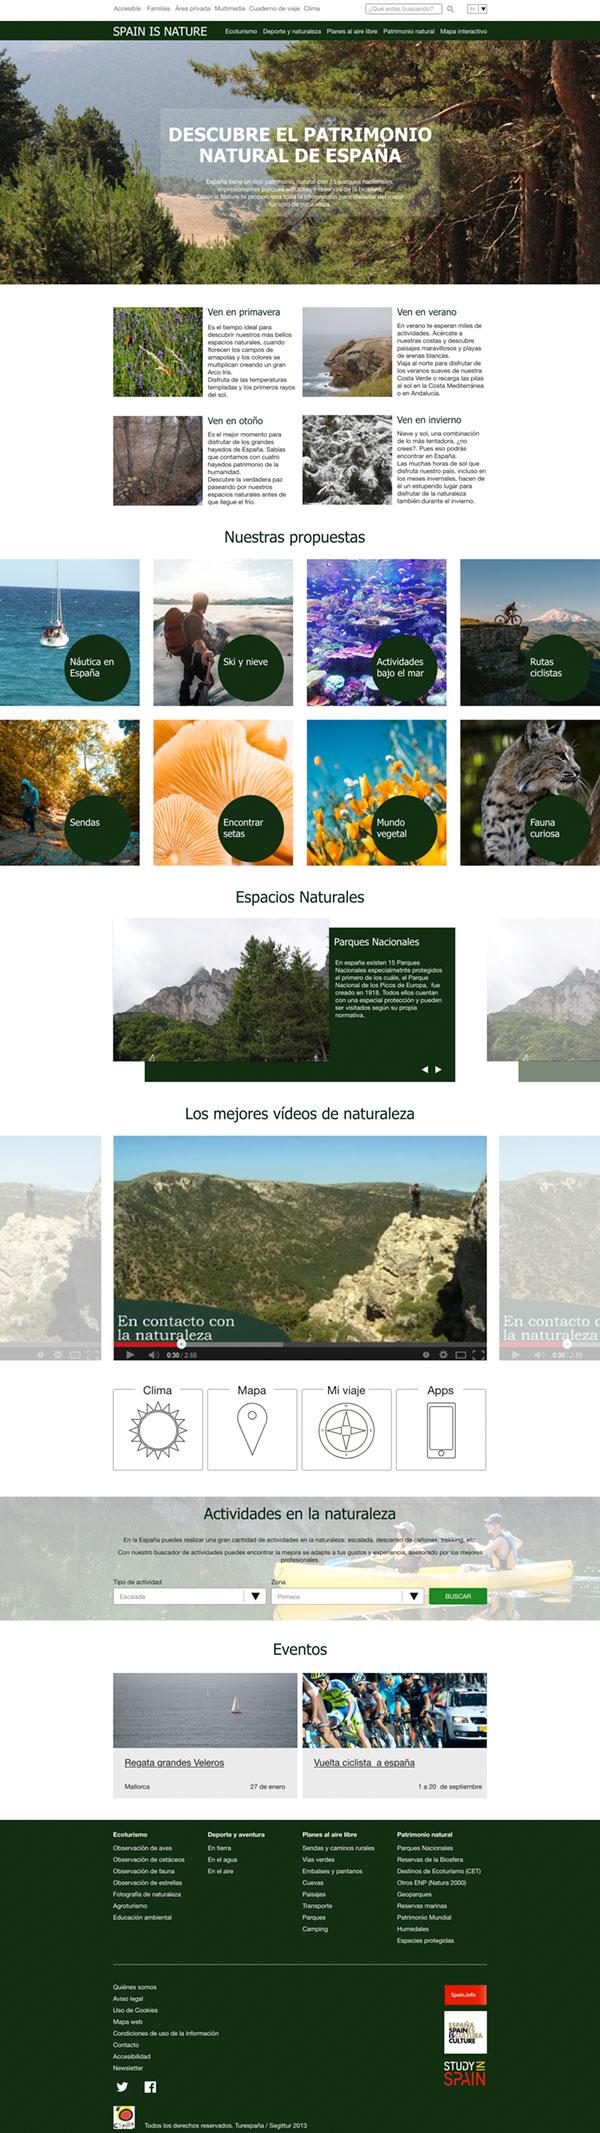 Página web de turismo de naturaleza en España